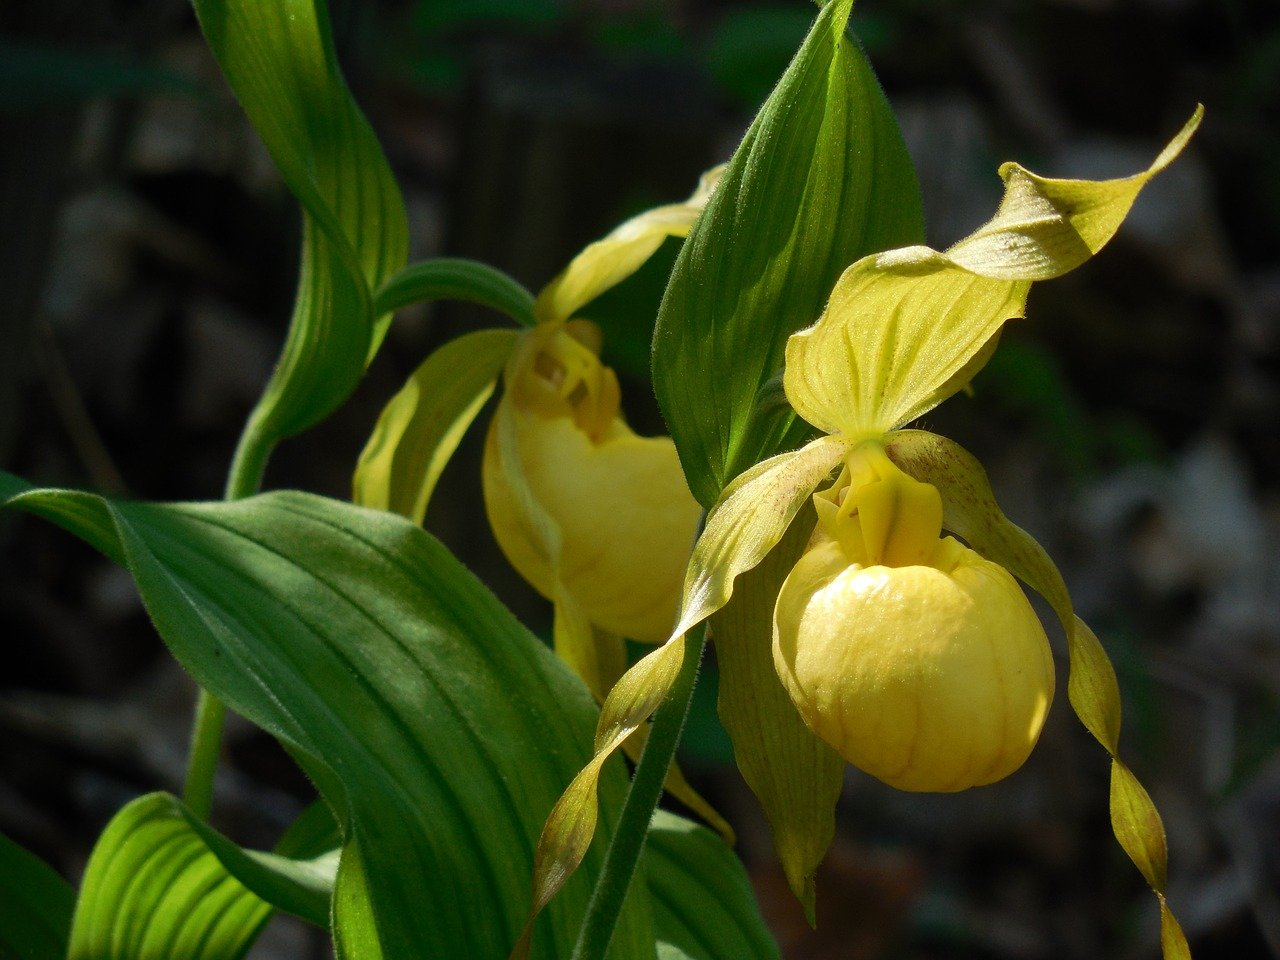 lady slipper orchid flower bloom